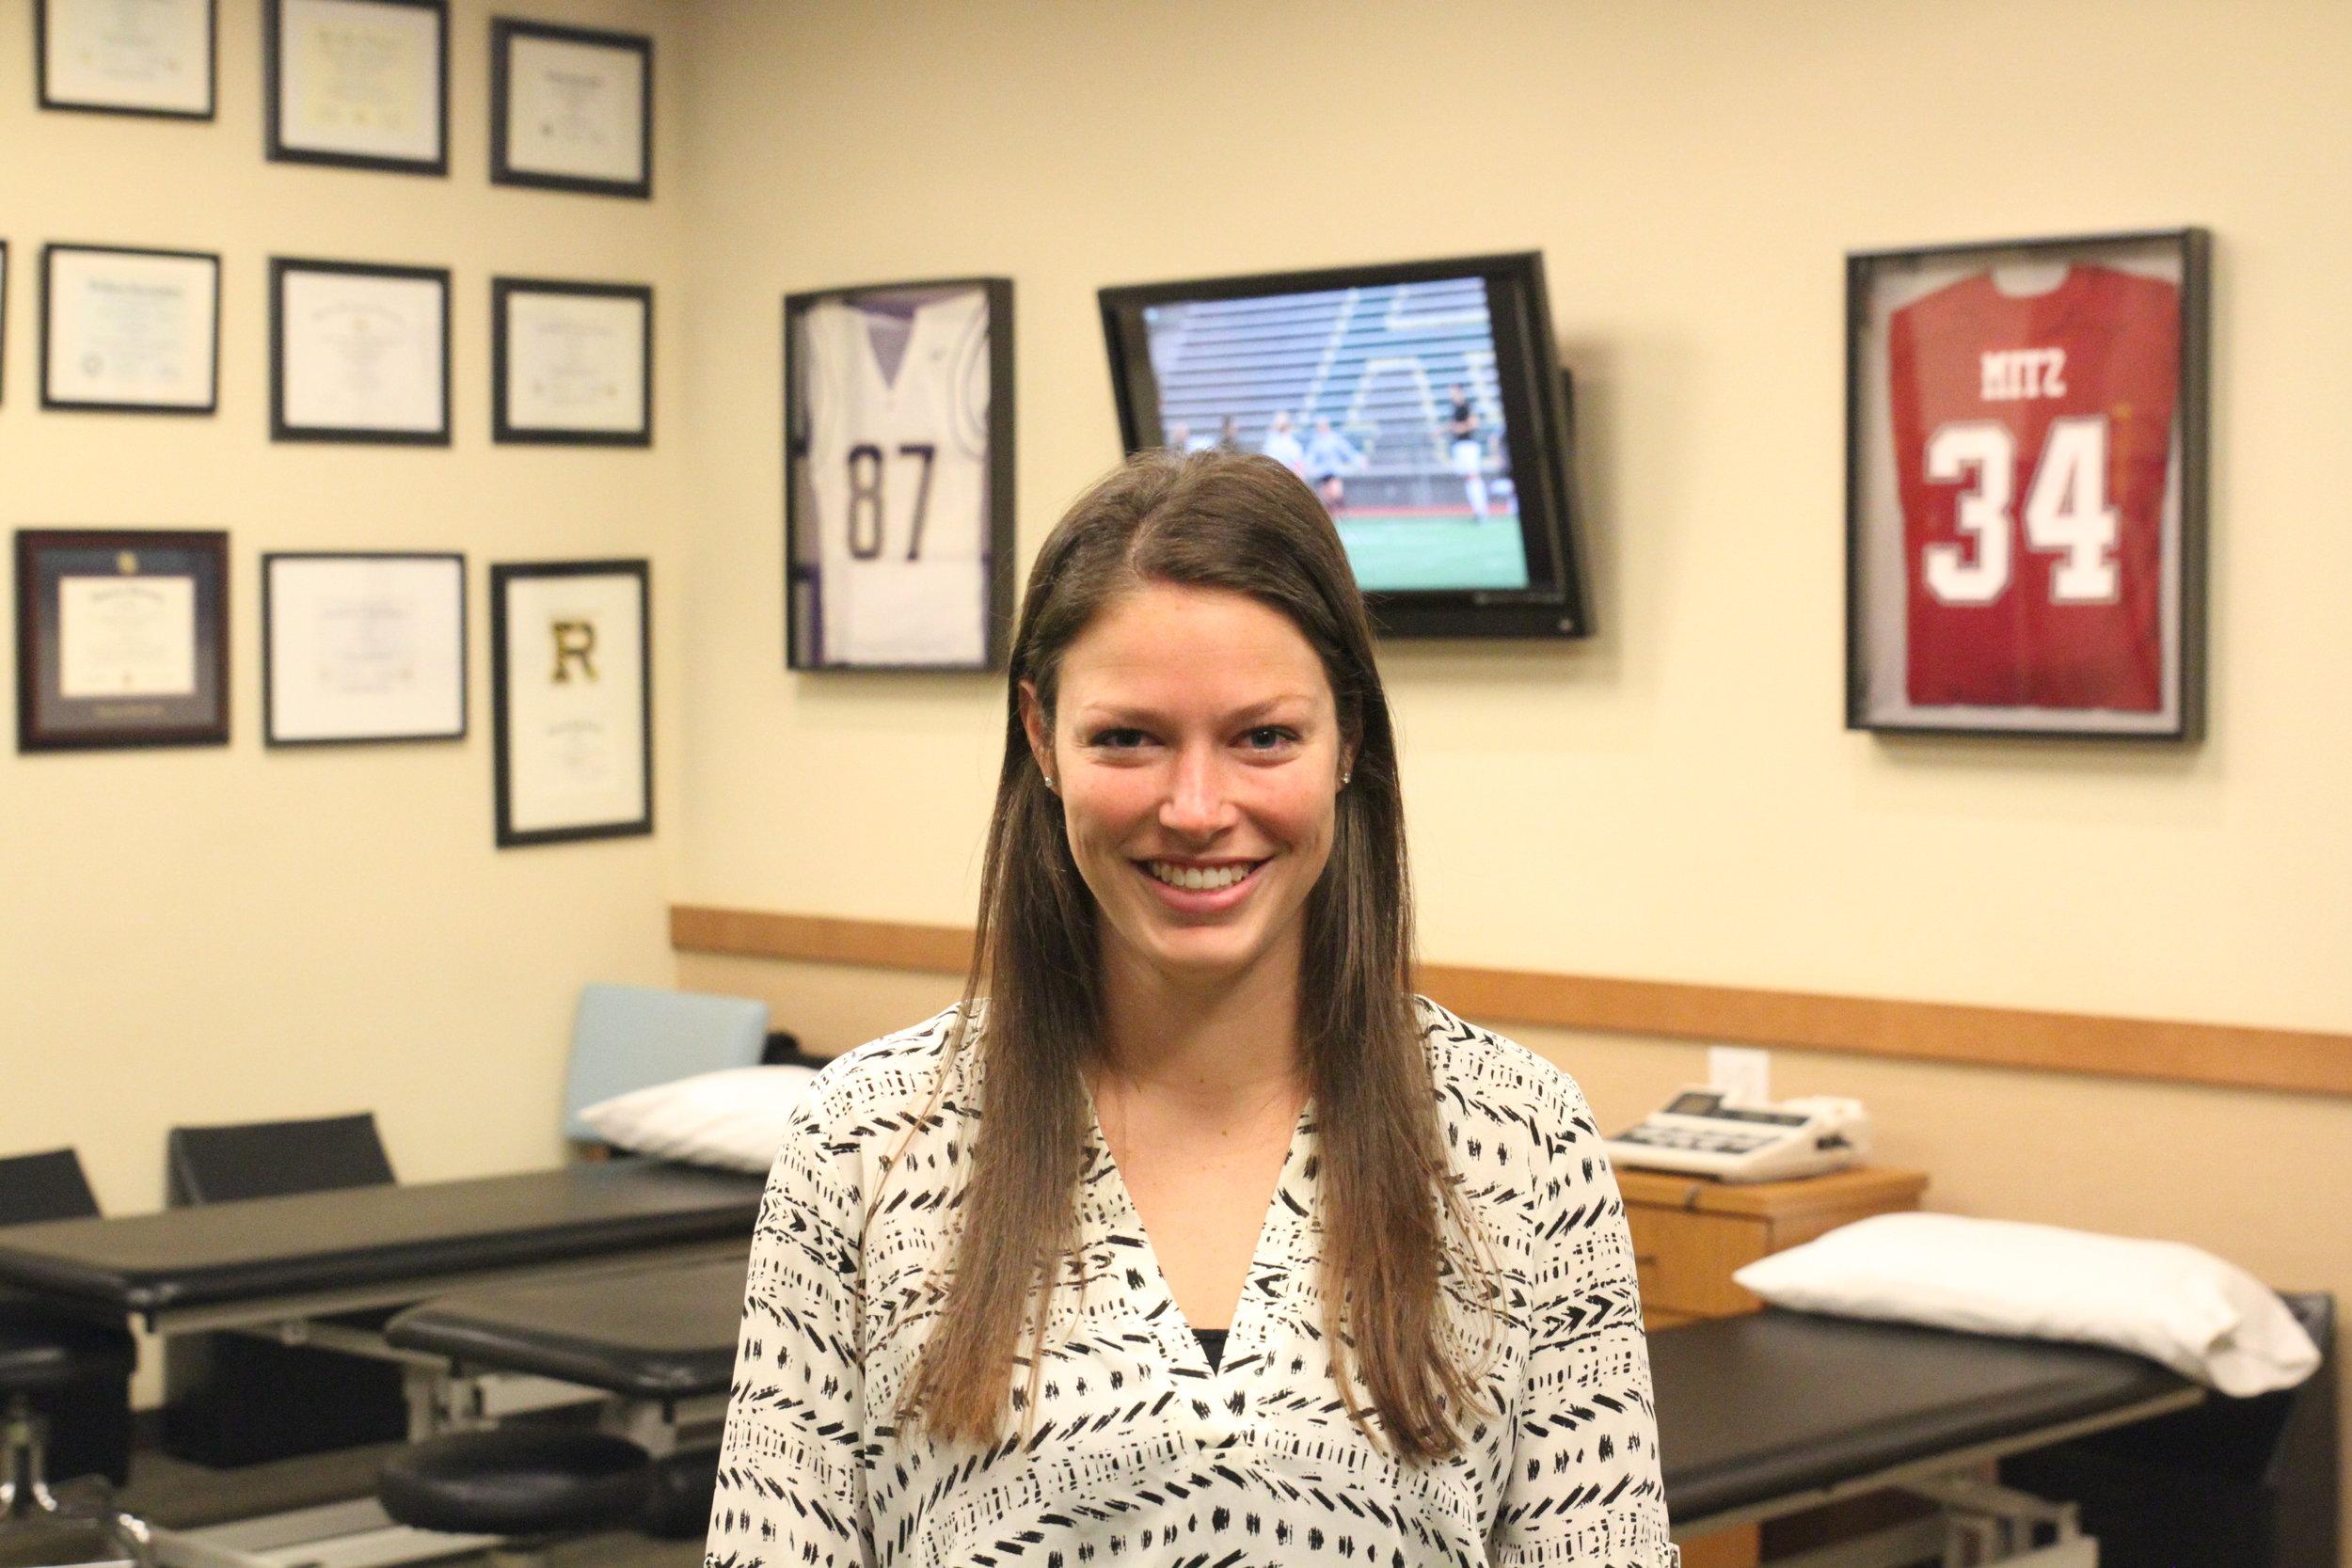 Megan O'Connell CV — Lake Washington Physical Therapy